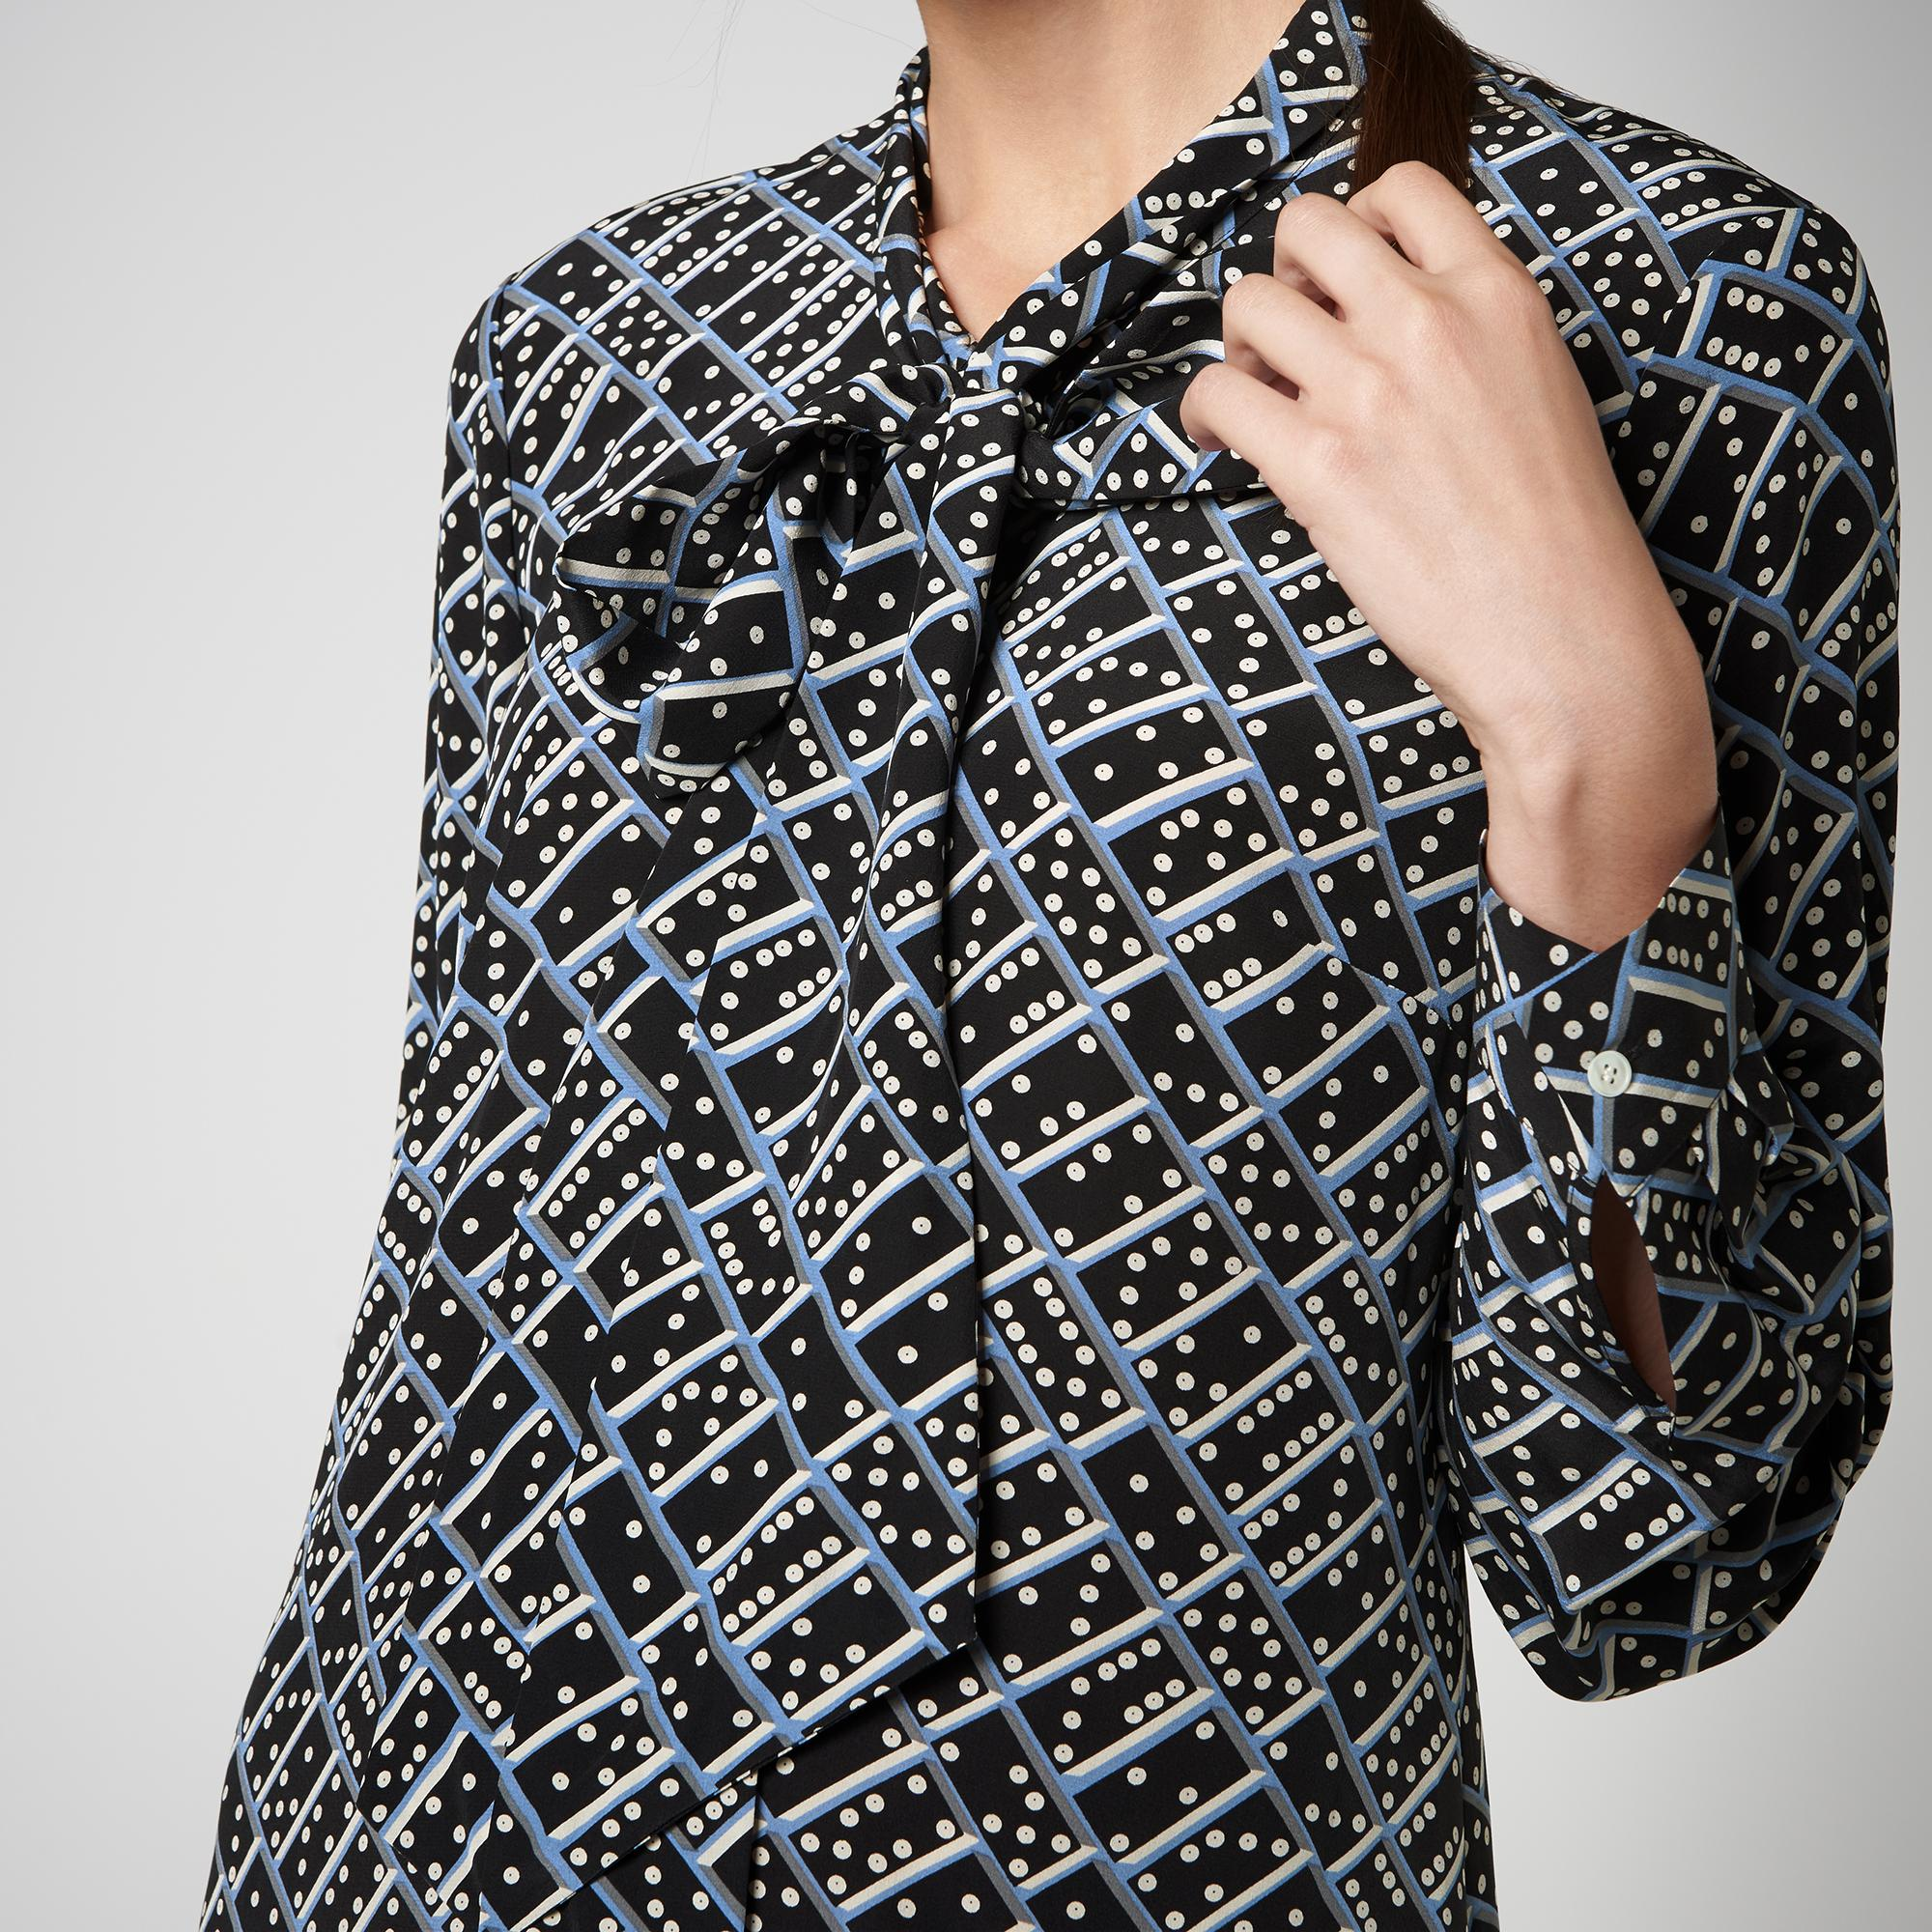 c27b6a2971e35 Lotte Domino Print Dress